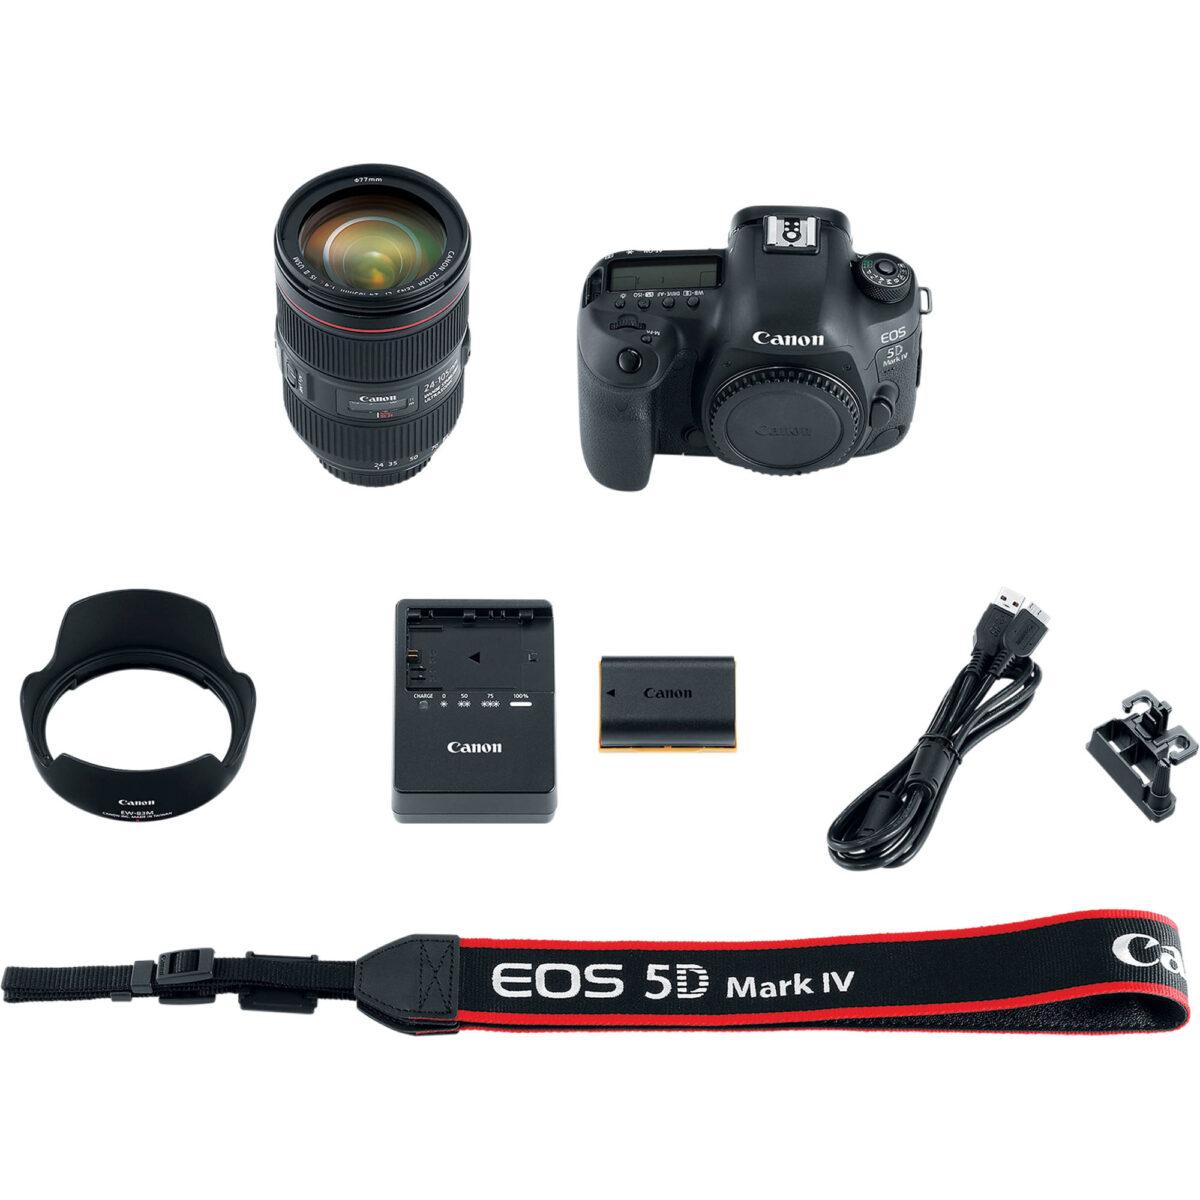 لوازم جانبی دوربین canon eos 5d mark IV در یزد کمرا